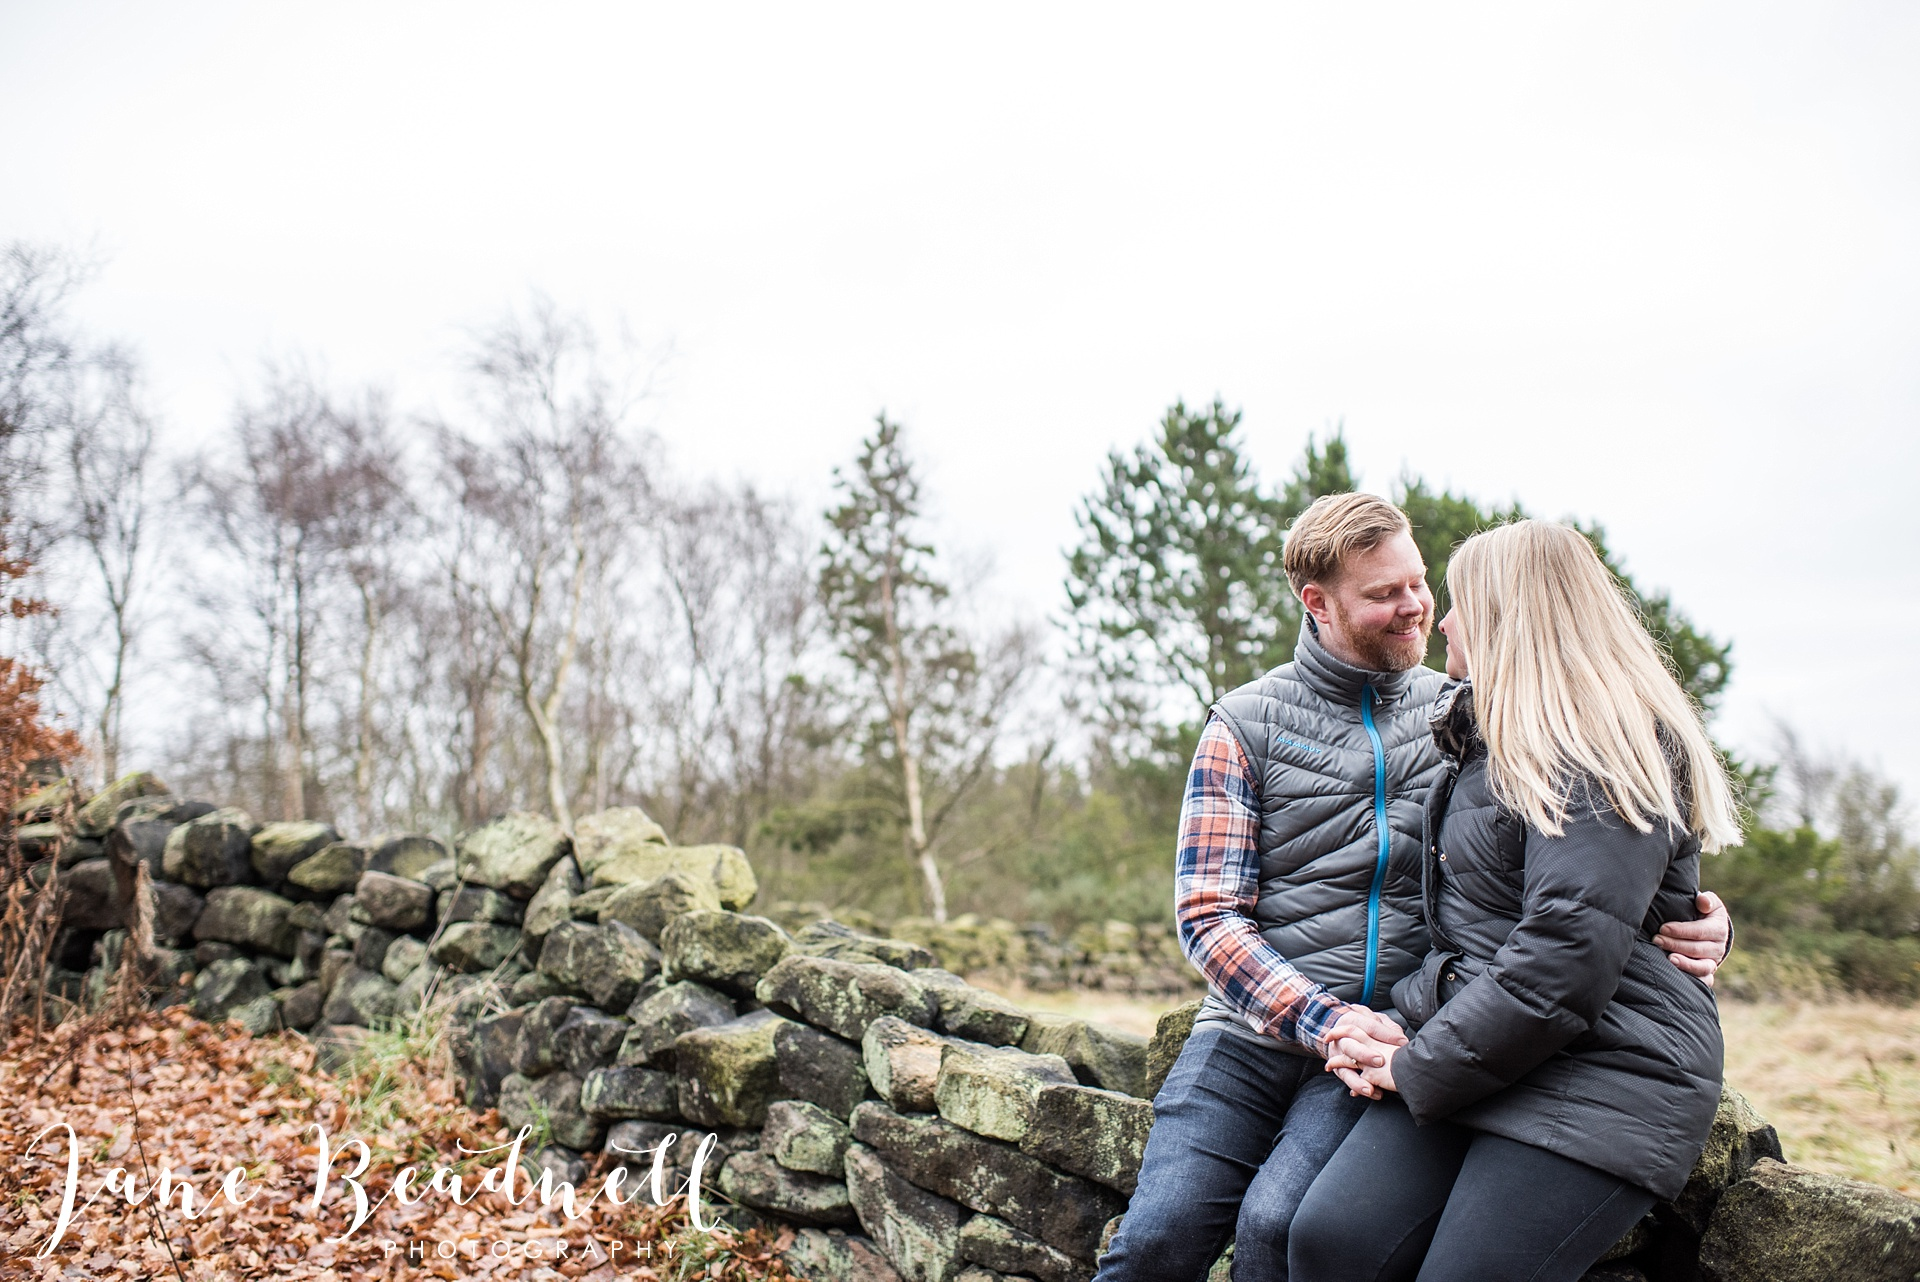 yorkshire-wedding-photographer-jane-beadnell-photography-uk-and-destination-wedding-photographer-engagement-shoot_0026